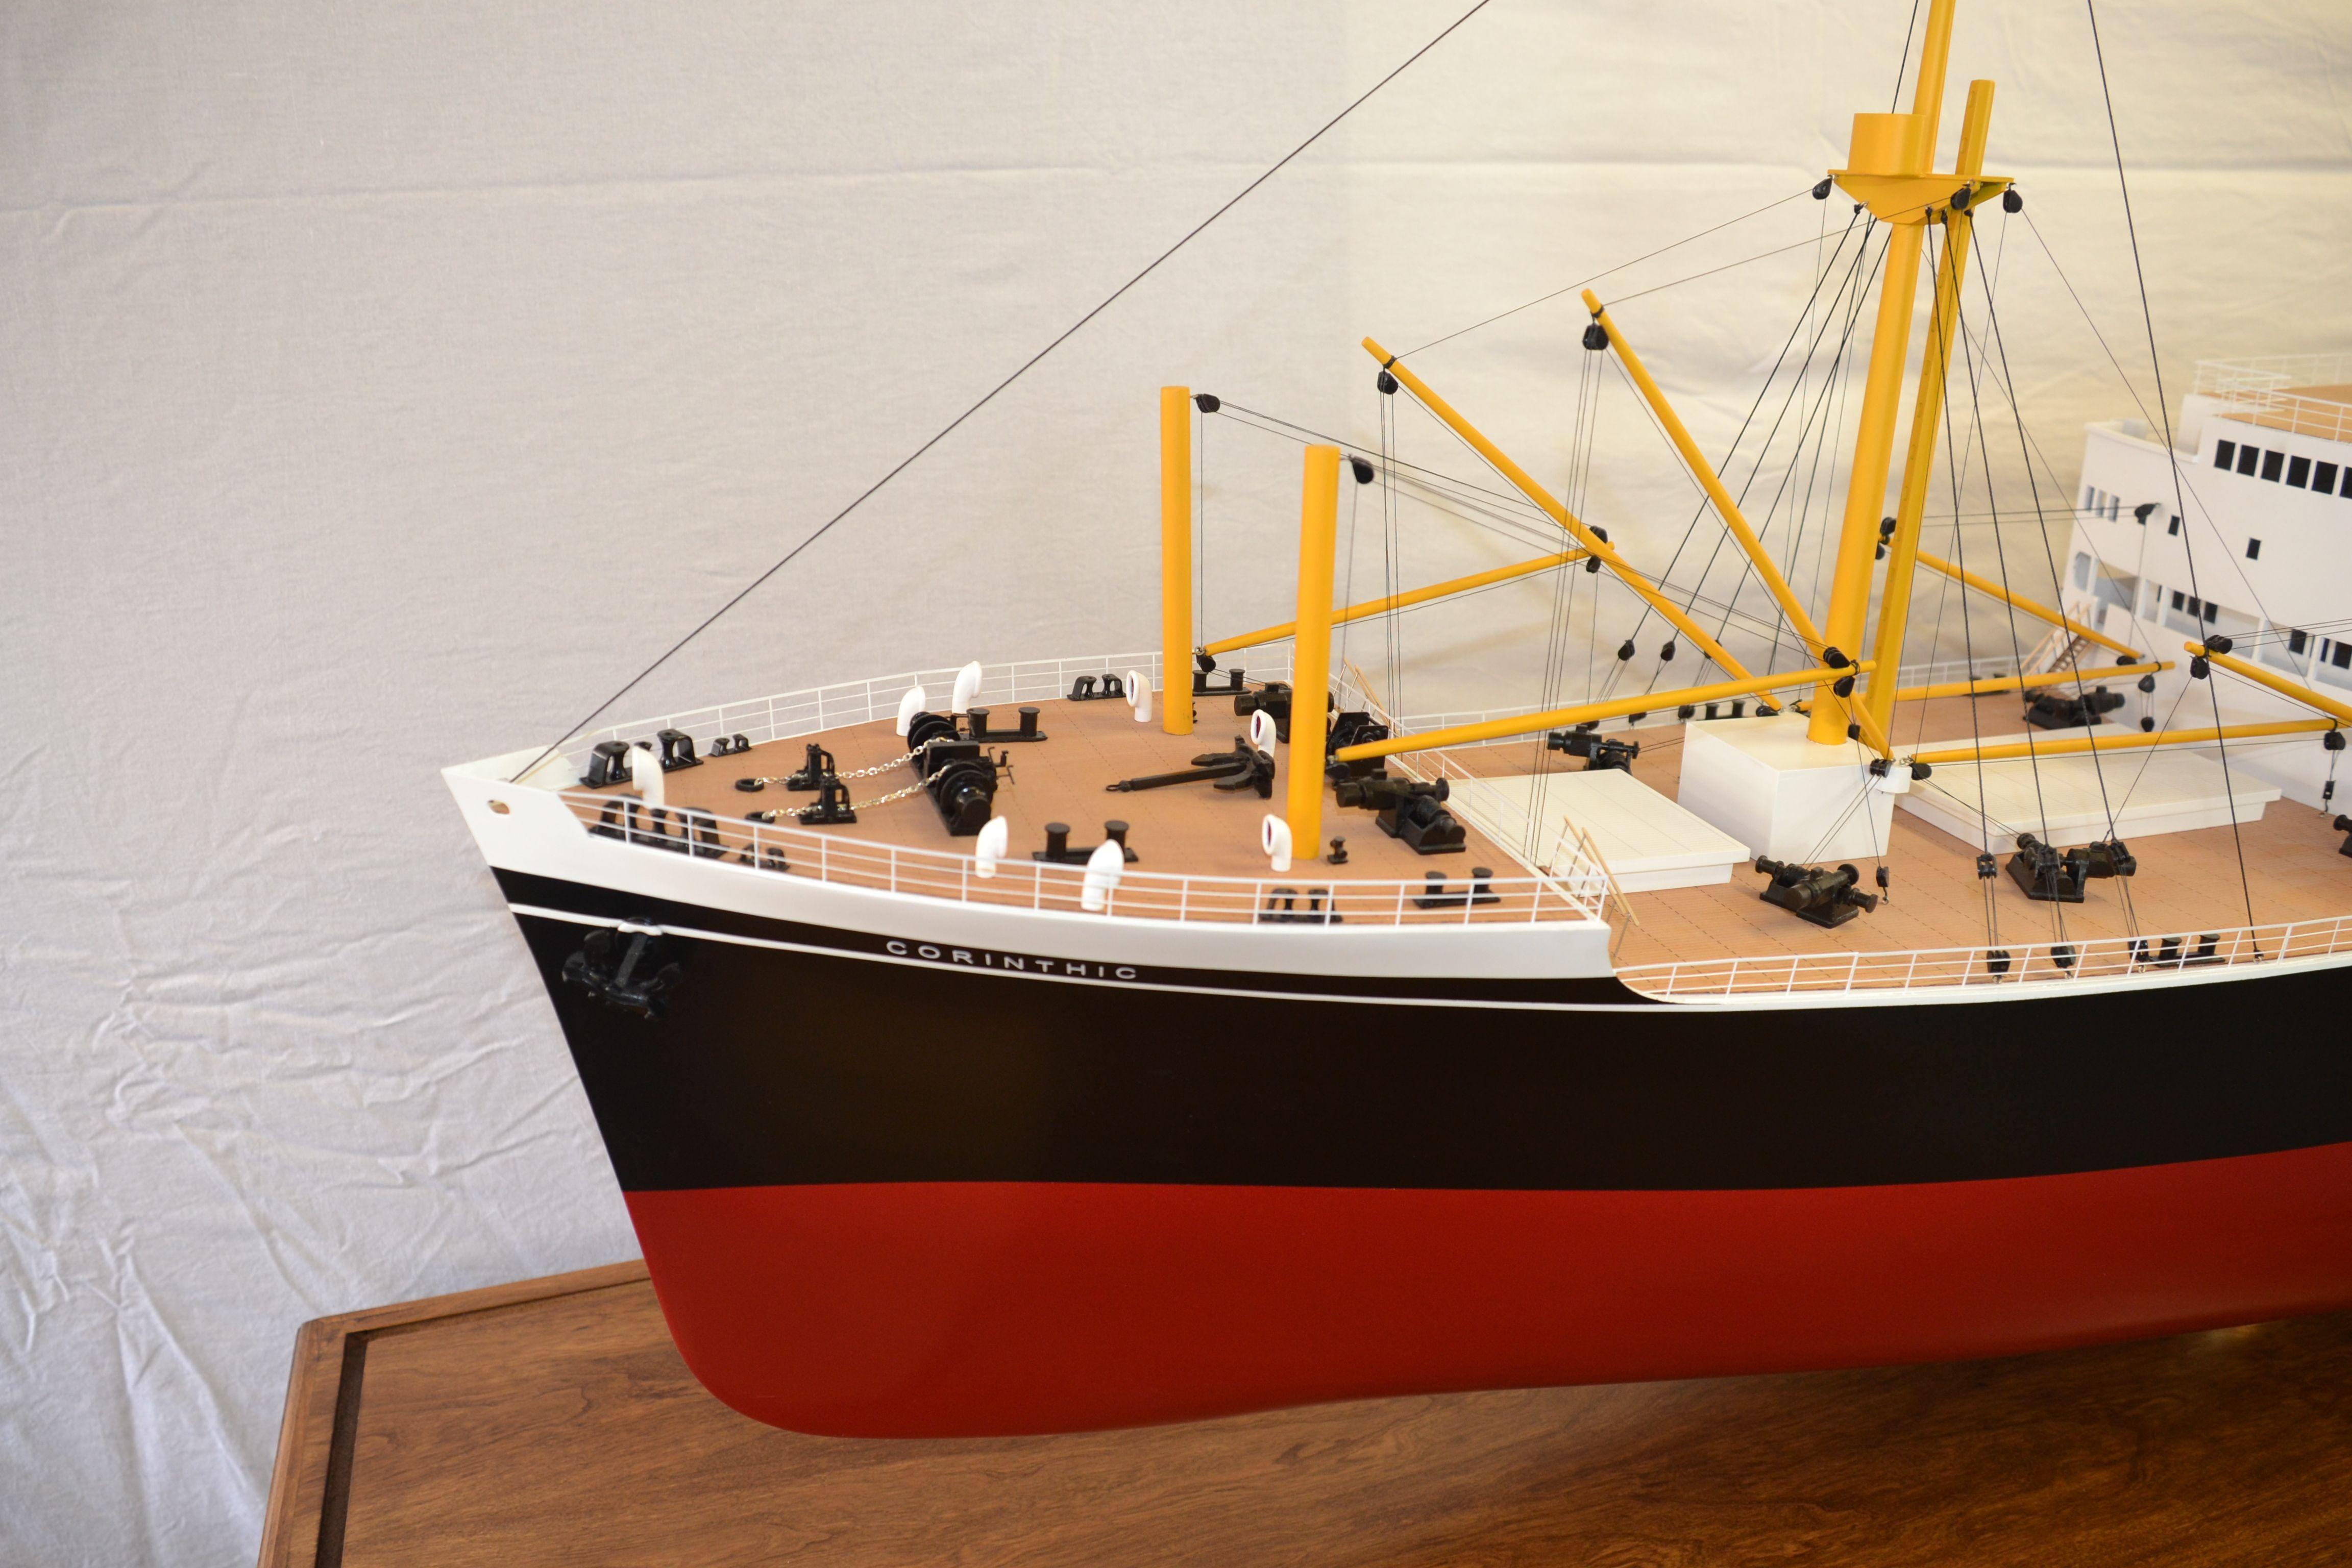 2209-12946-SS-Corinthic-Model-Ship